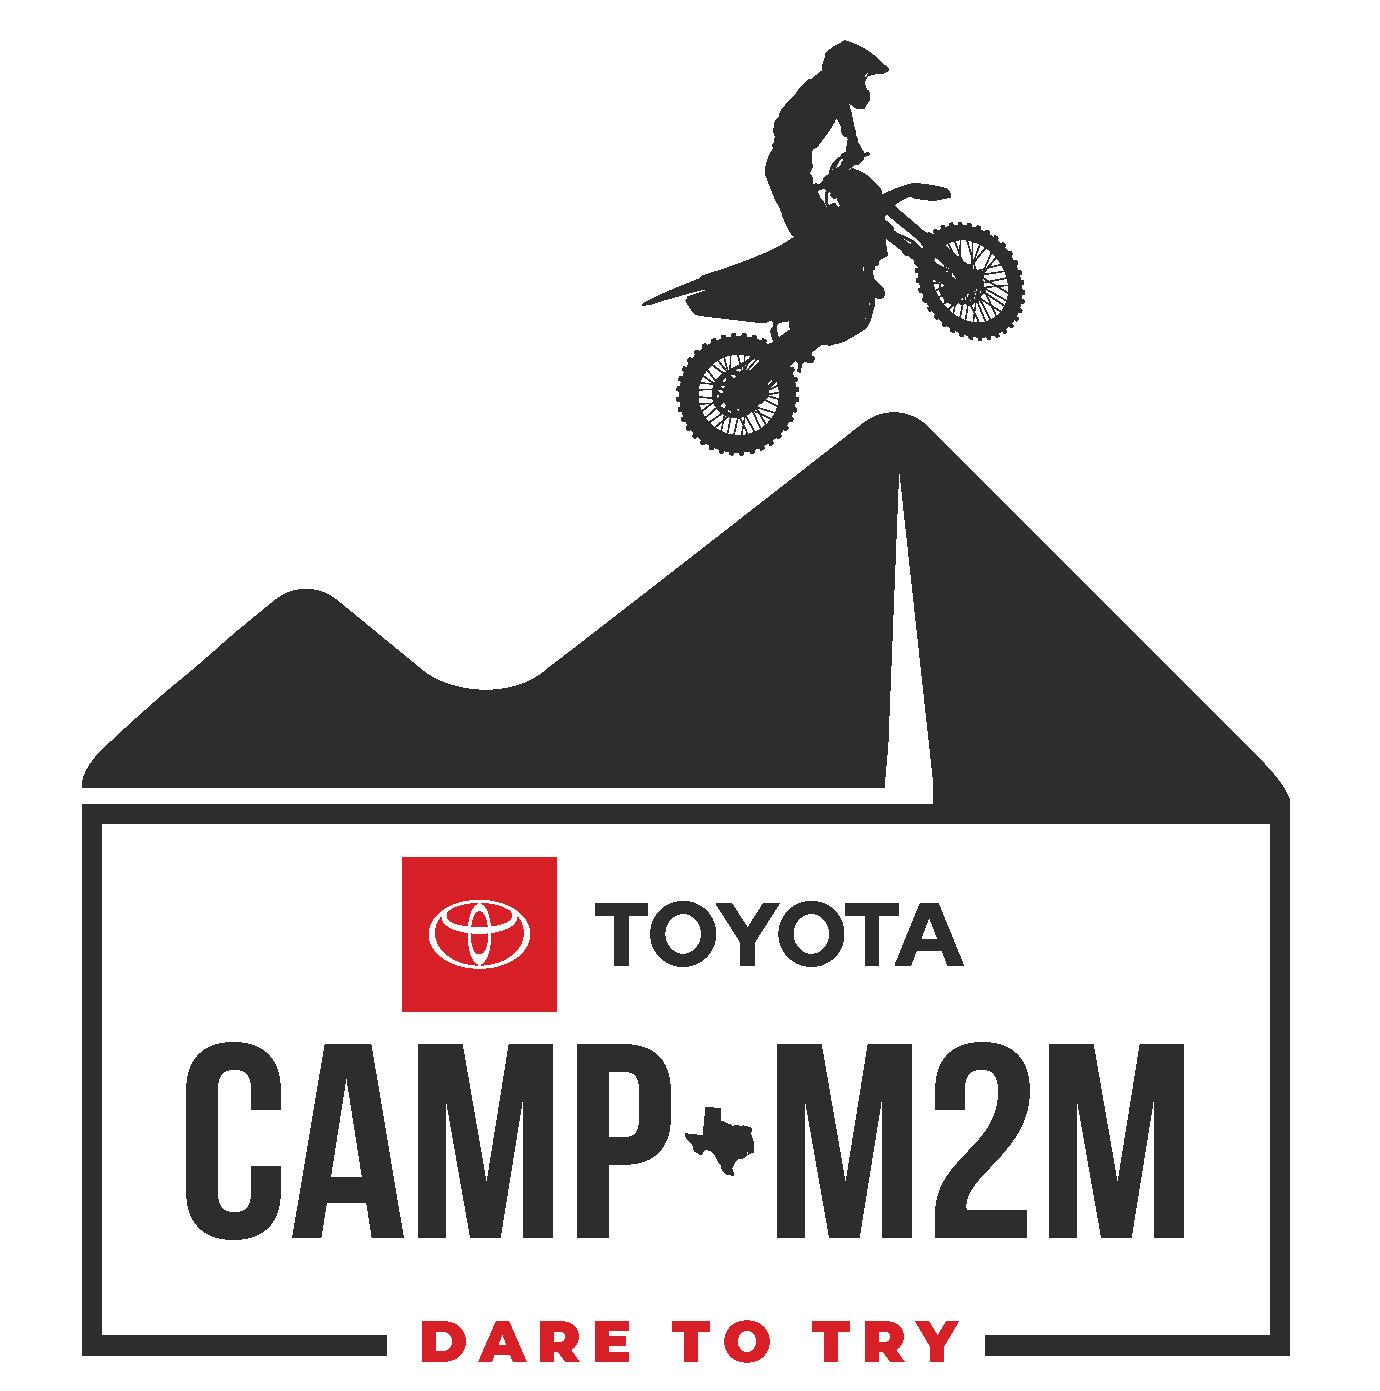 Camp M2M